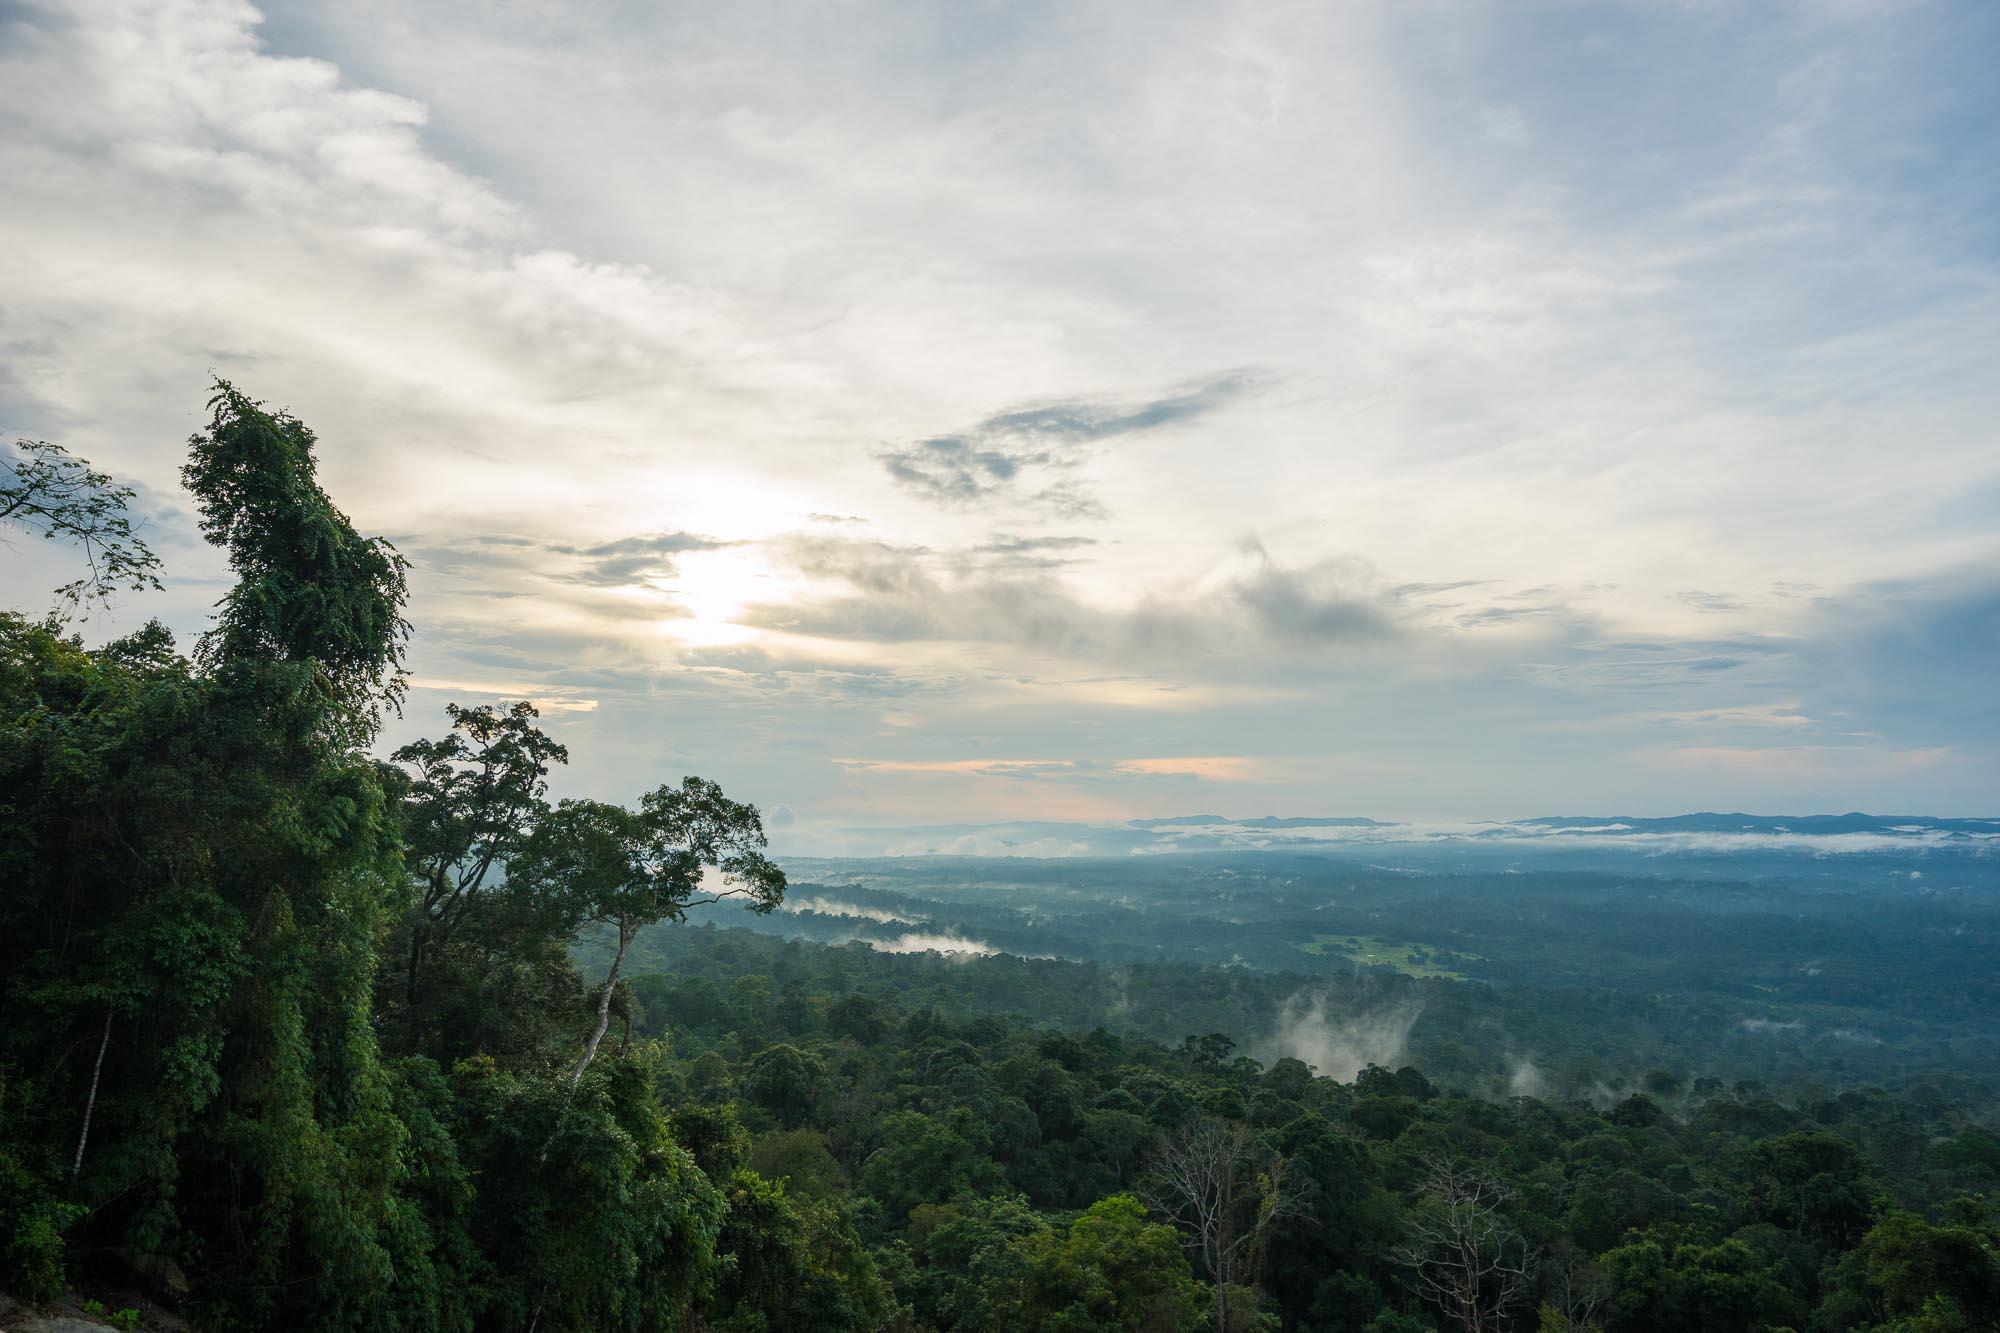 Khao Yai National Park Viewpoint, Thailand